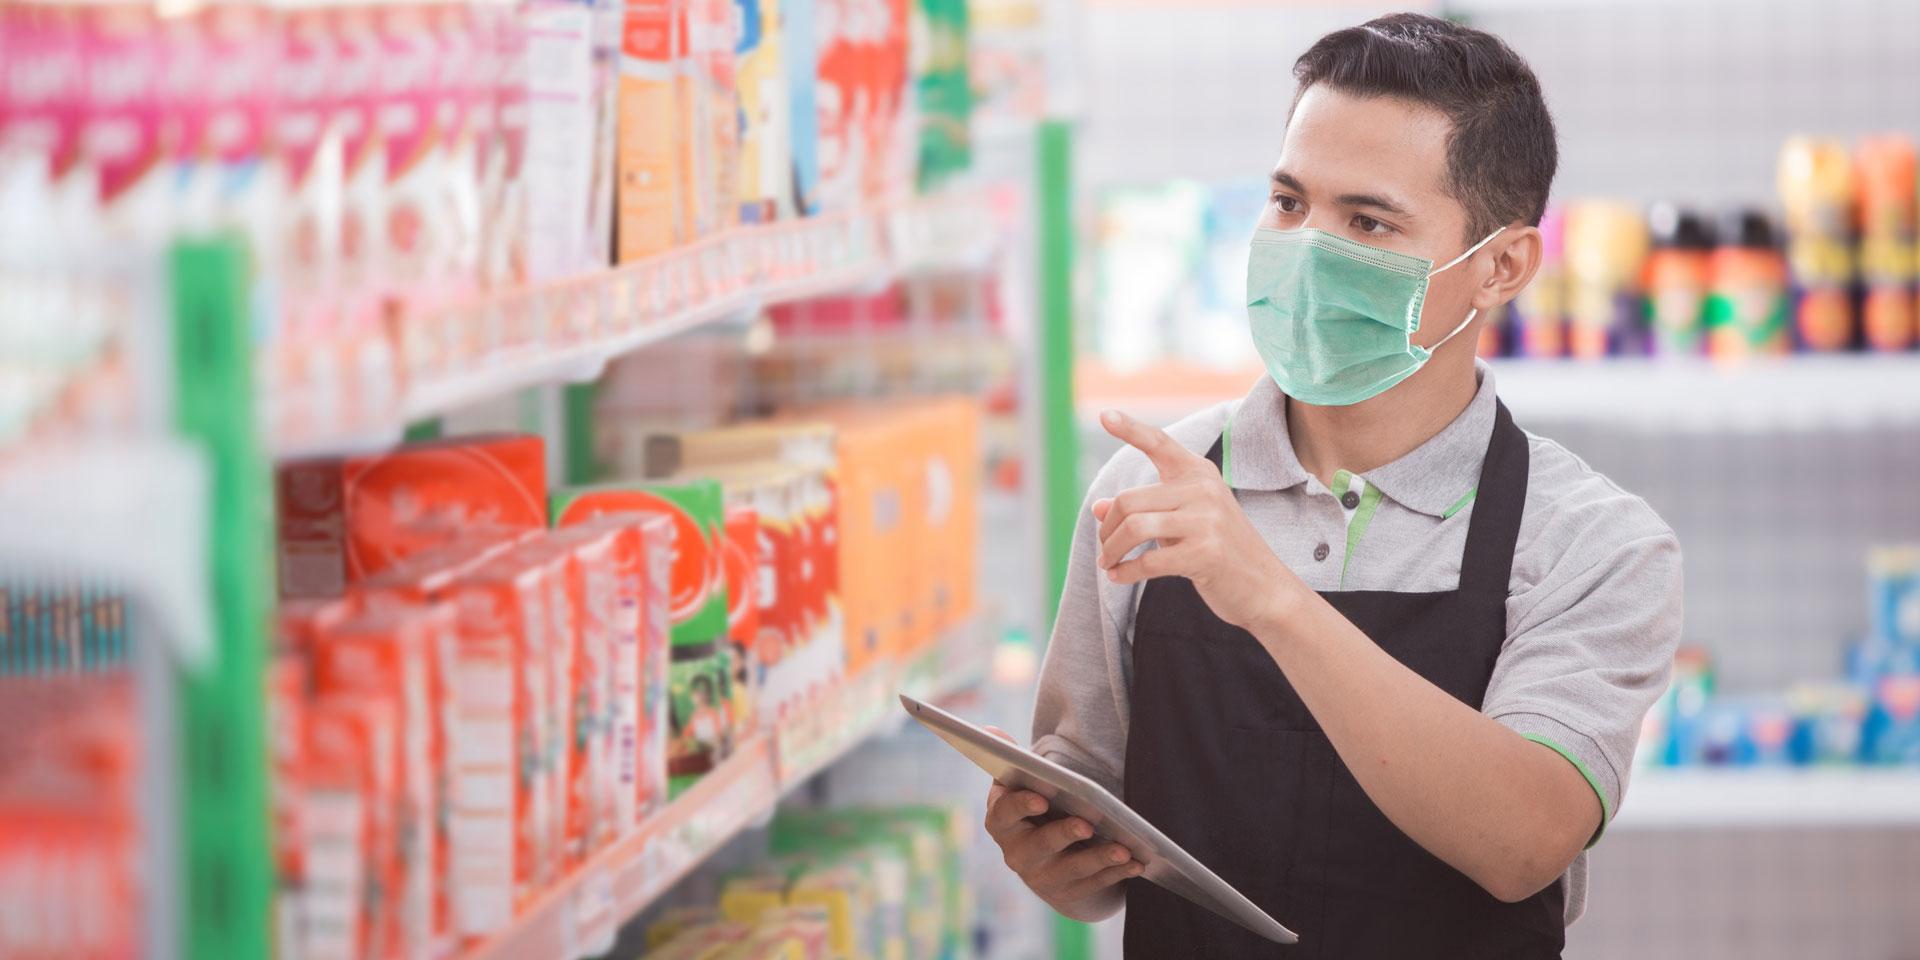 3 technologies that will redefine tomorrow's retail jobs